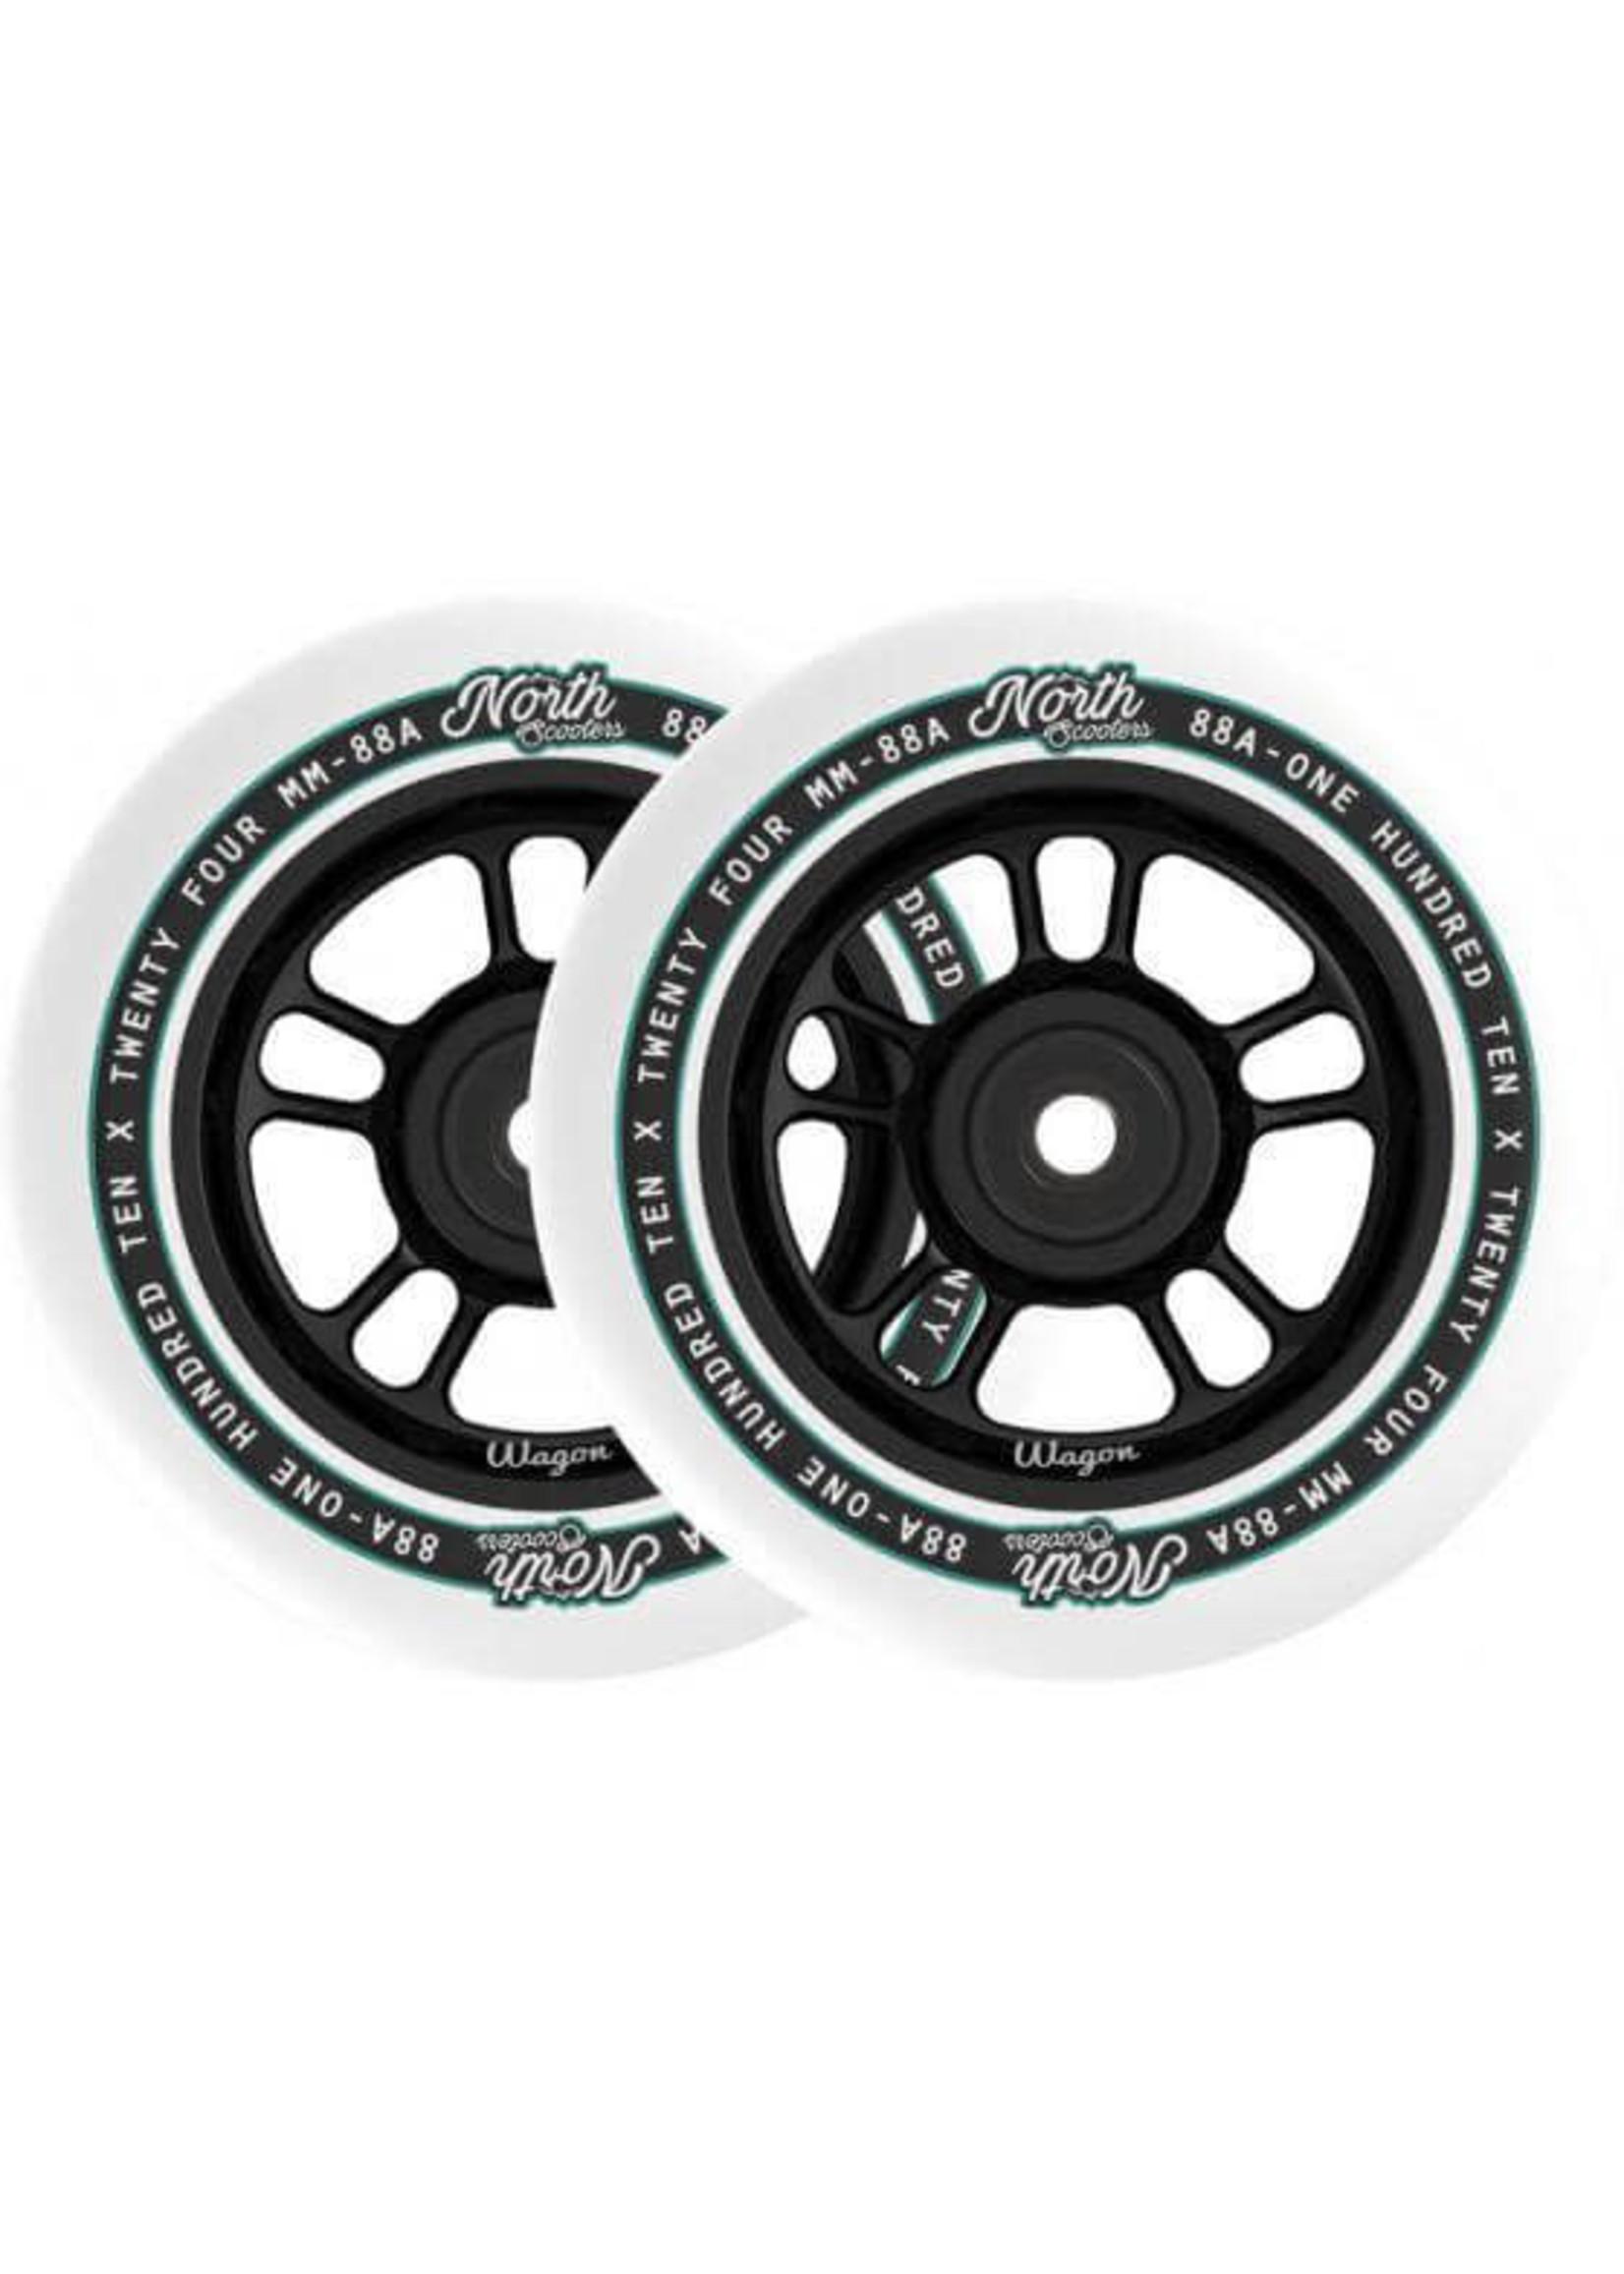 North North -  Wagon Wheels - 110mm